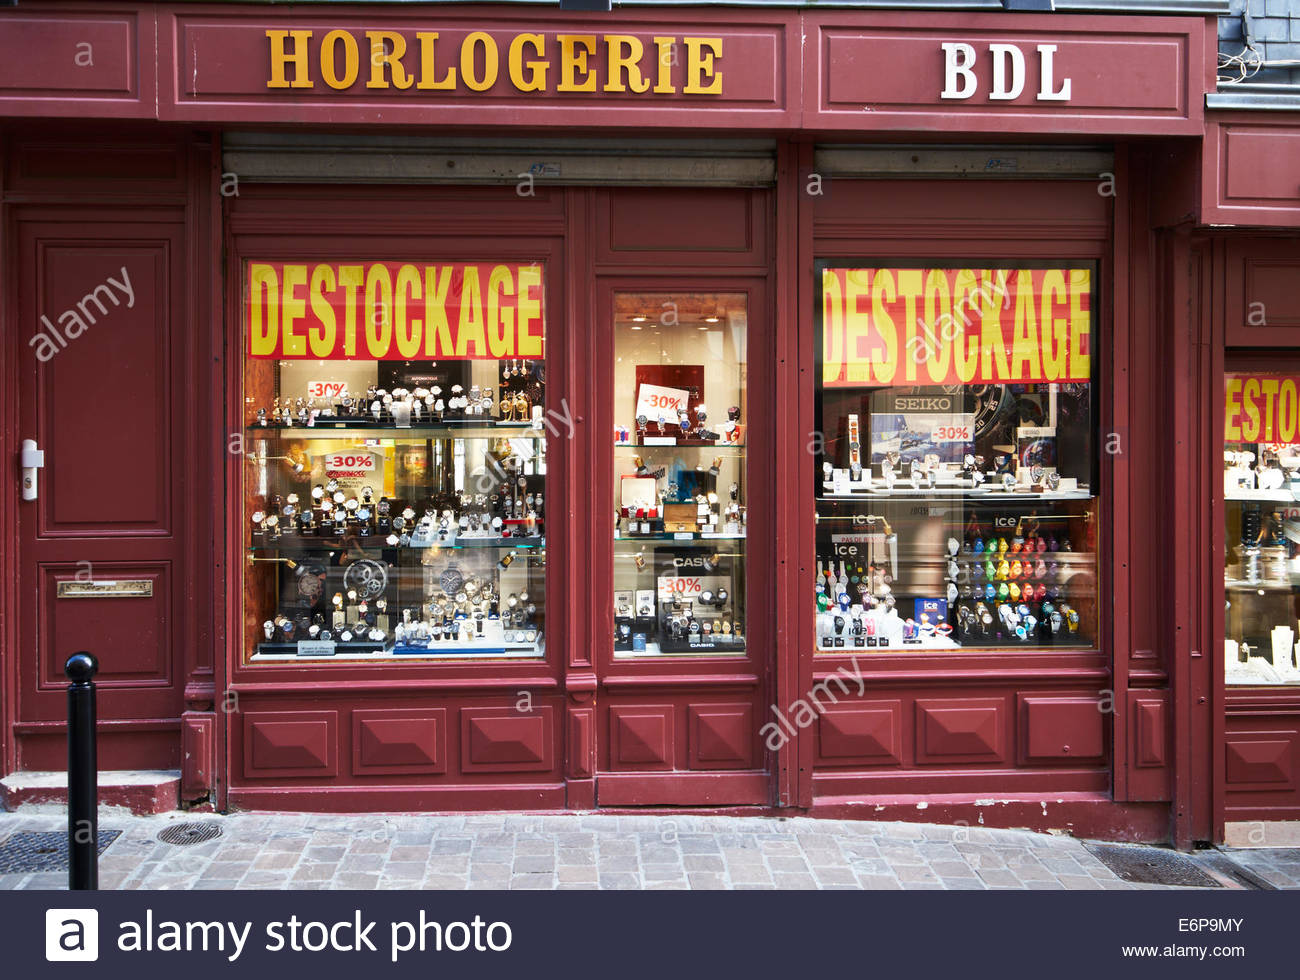 Honfleur, France. Watch and Clock, horologist or watch maker, clockmaker, shop stock clearance sale Horlogerie Destockage - Stock Image